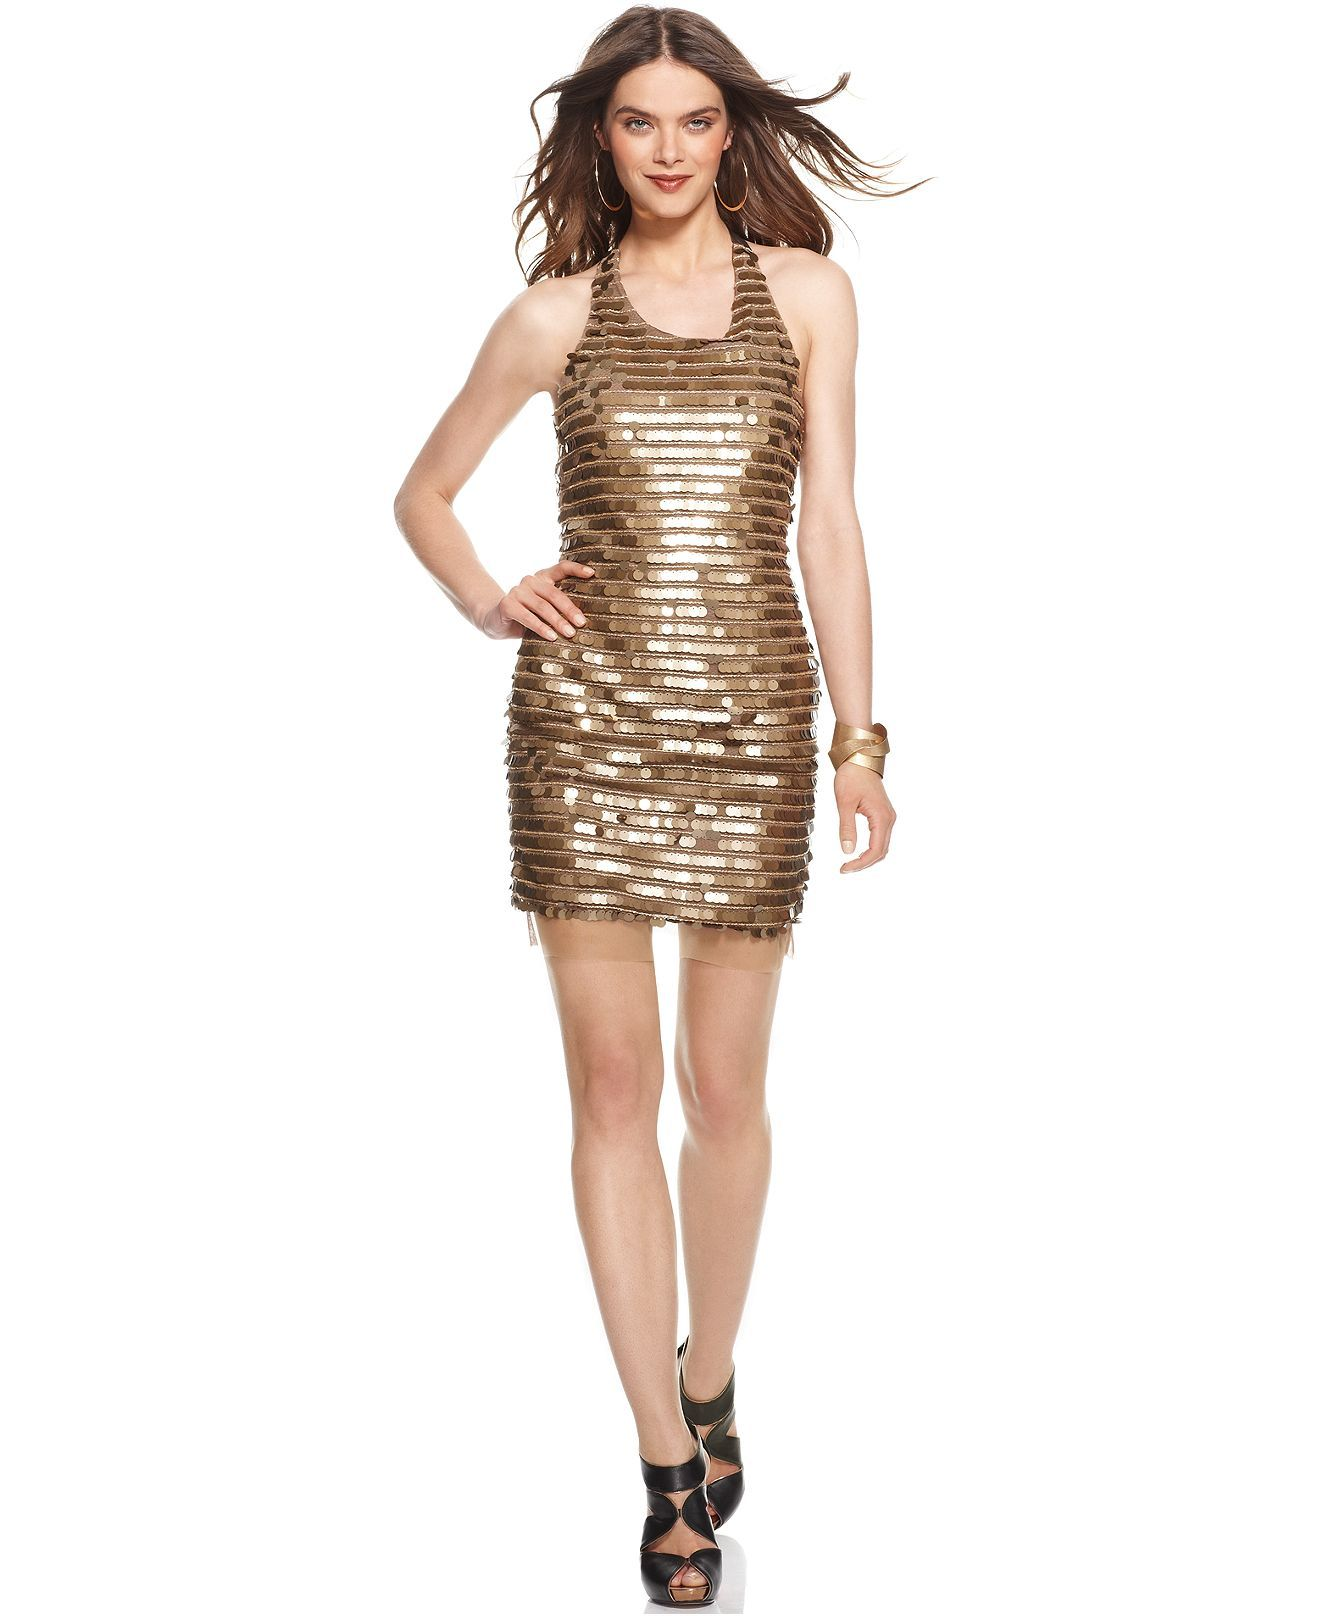 be42e8d0f BCBGMAXAZRIA Dress, Sleeveless Sequin Cocktail Dress - Womens Dresses -  Macy's. Slightly worried about the